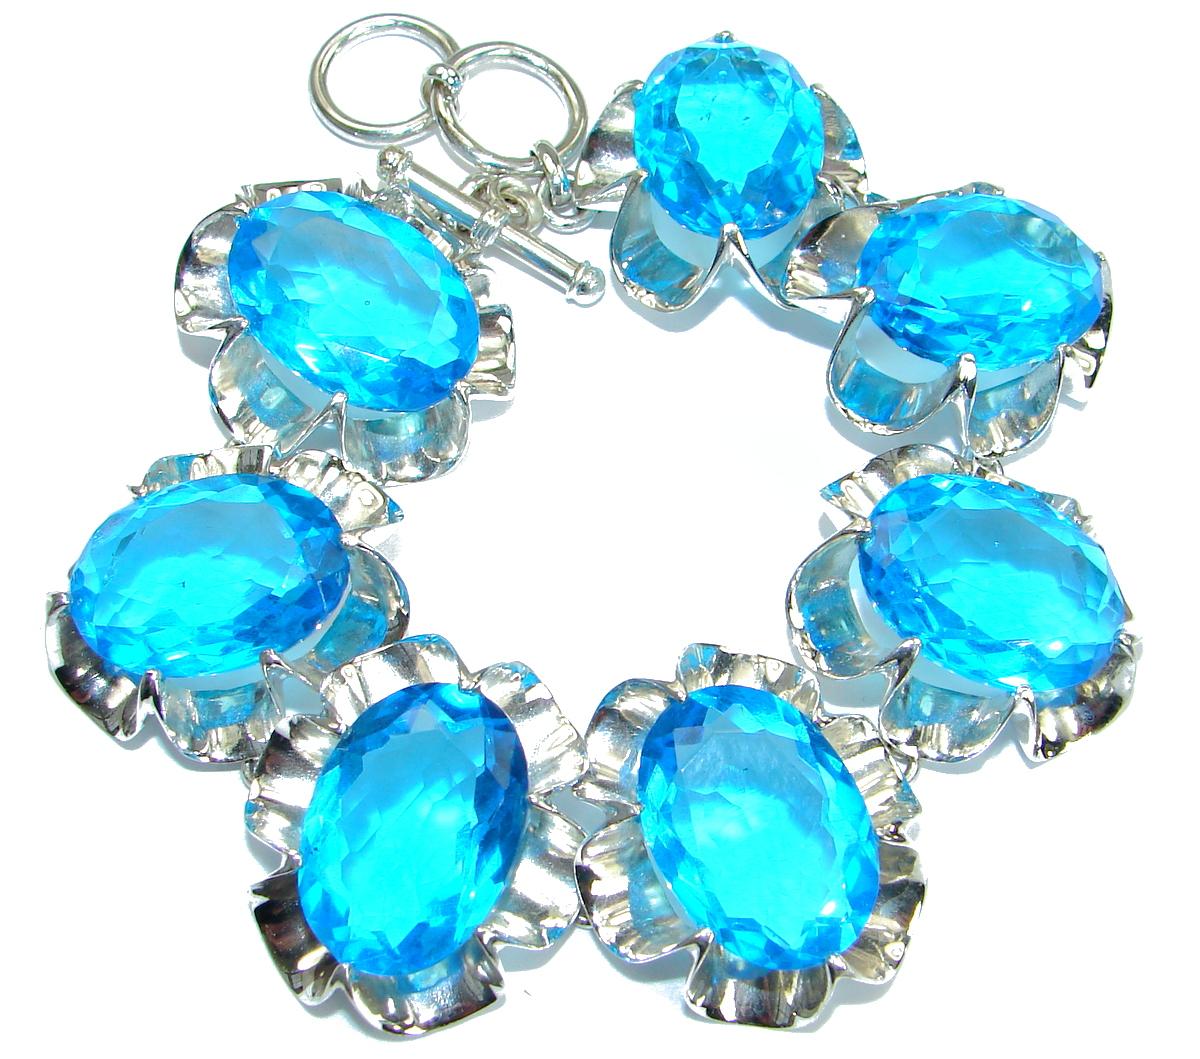 Huge  Rich Blue  Ocean Quartz   .925  Sterling Silver handmade Bracelet